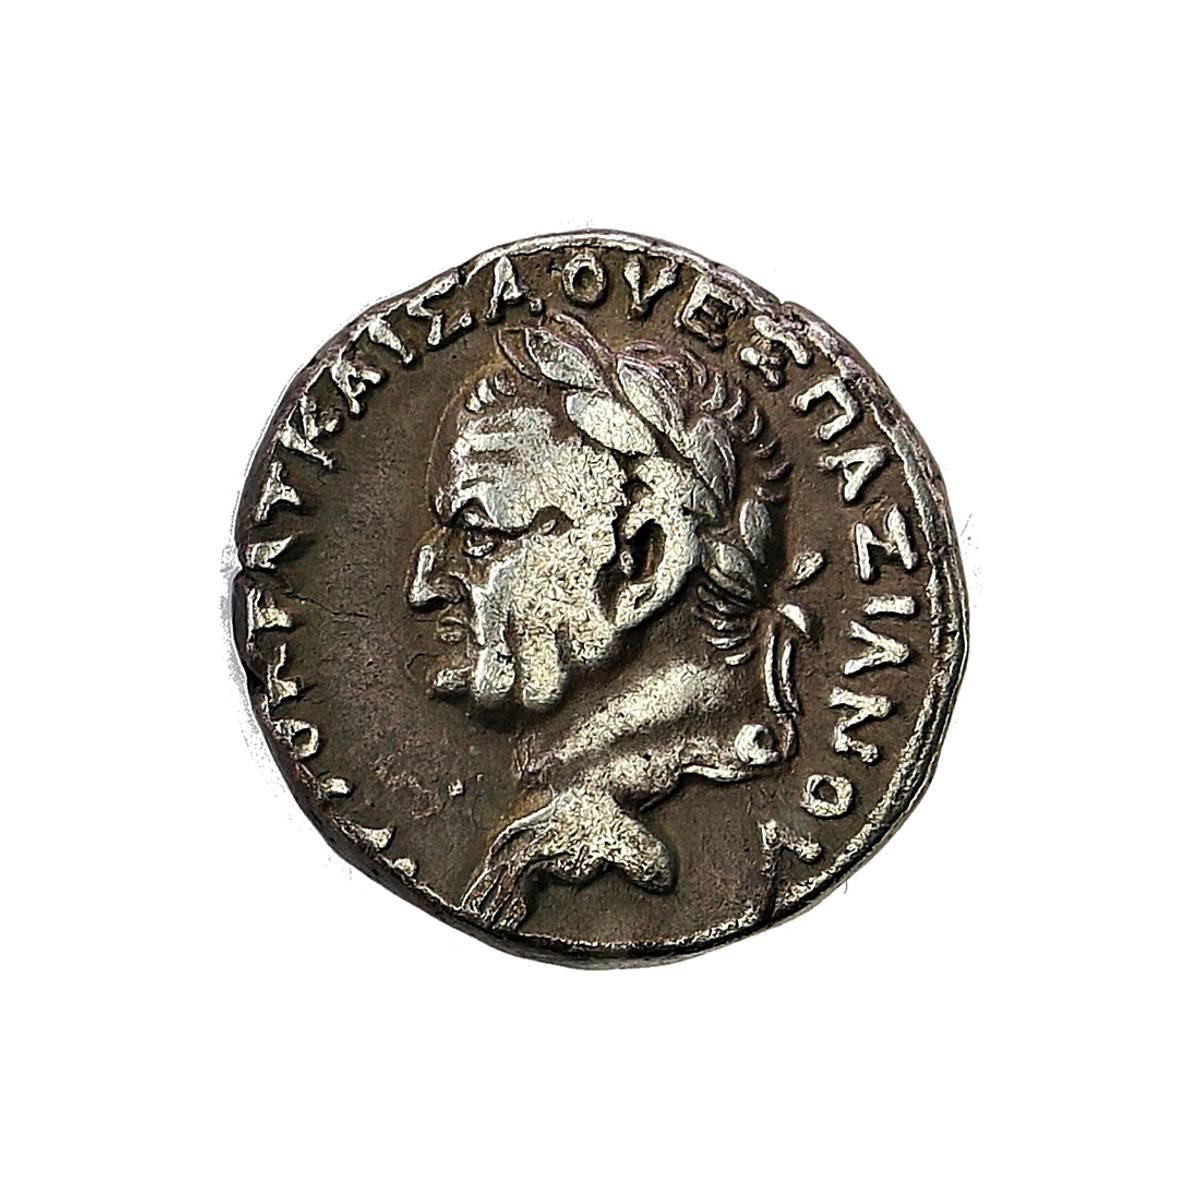 Titus & Vespasian Tetradrakme 69-79